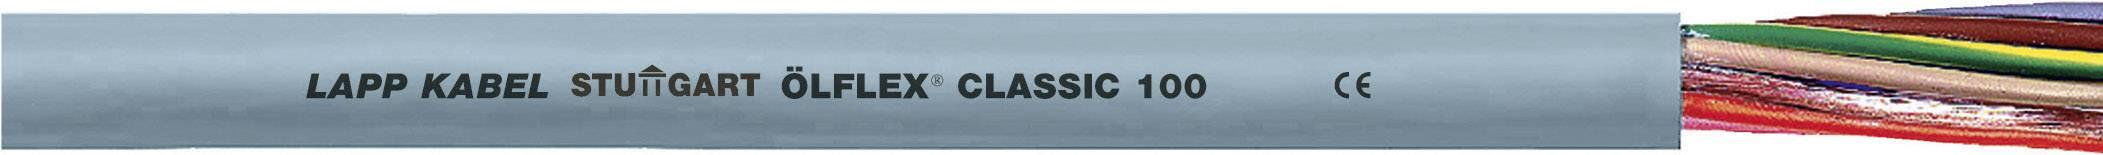 Kabel LappKabel Ölflex CLASSIC 100 4G185 (00103123), PVC, 62,8 mm, 750 V, šedá, 50 m